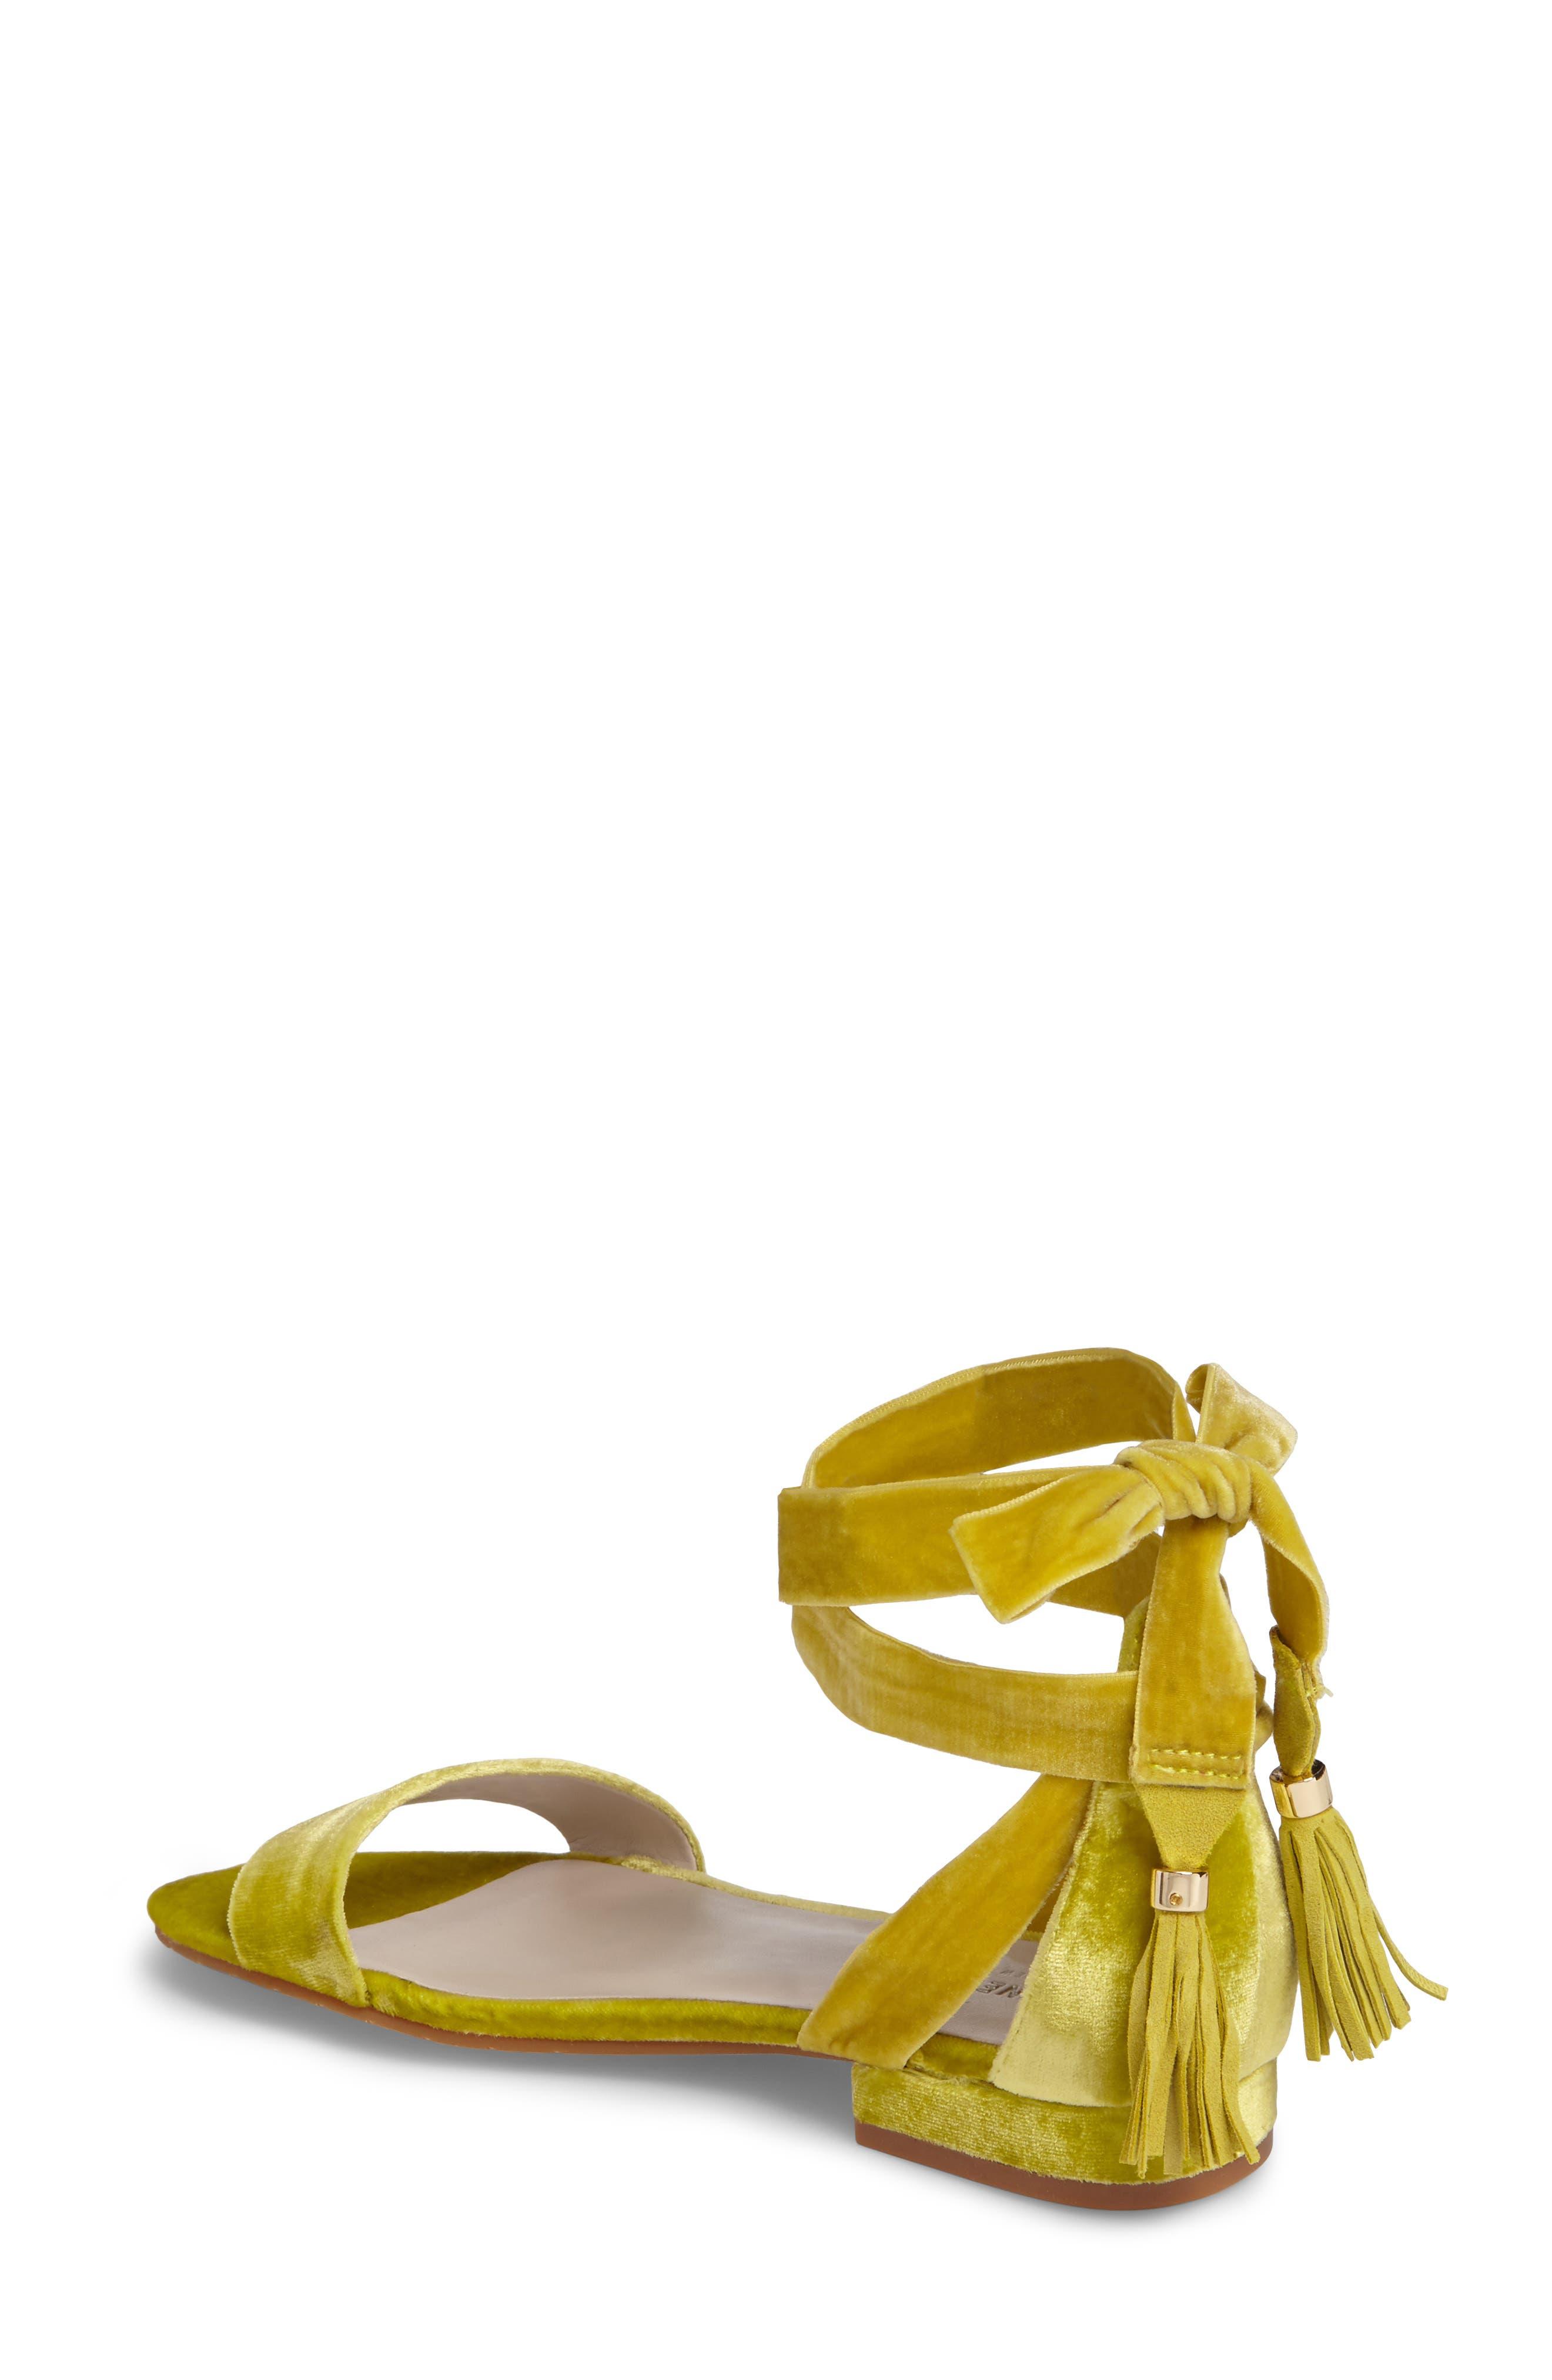 Valen Tassel Lace-Up Sandal,                             Alternate thumbnail 21, color,